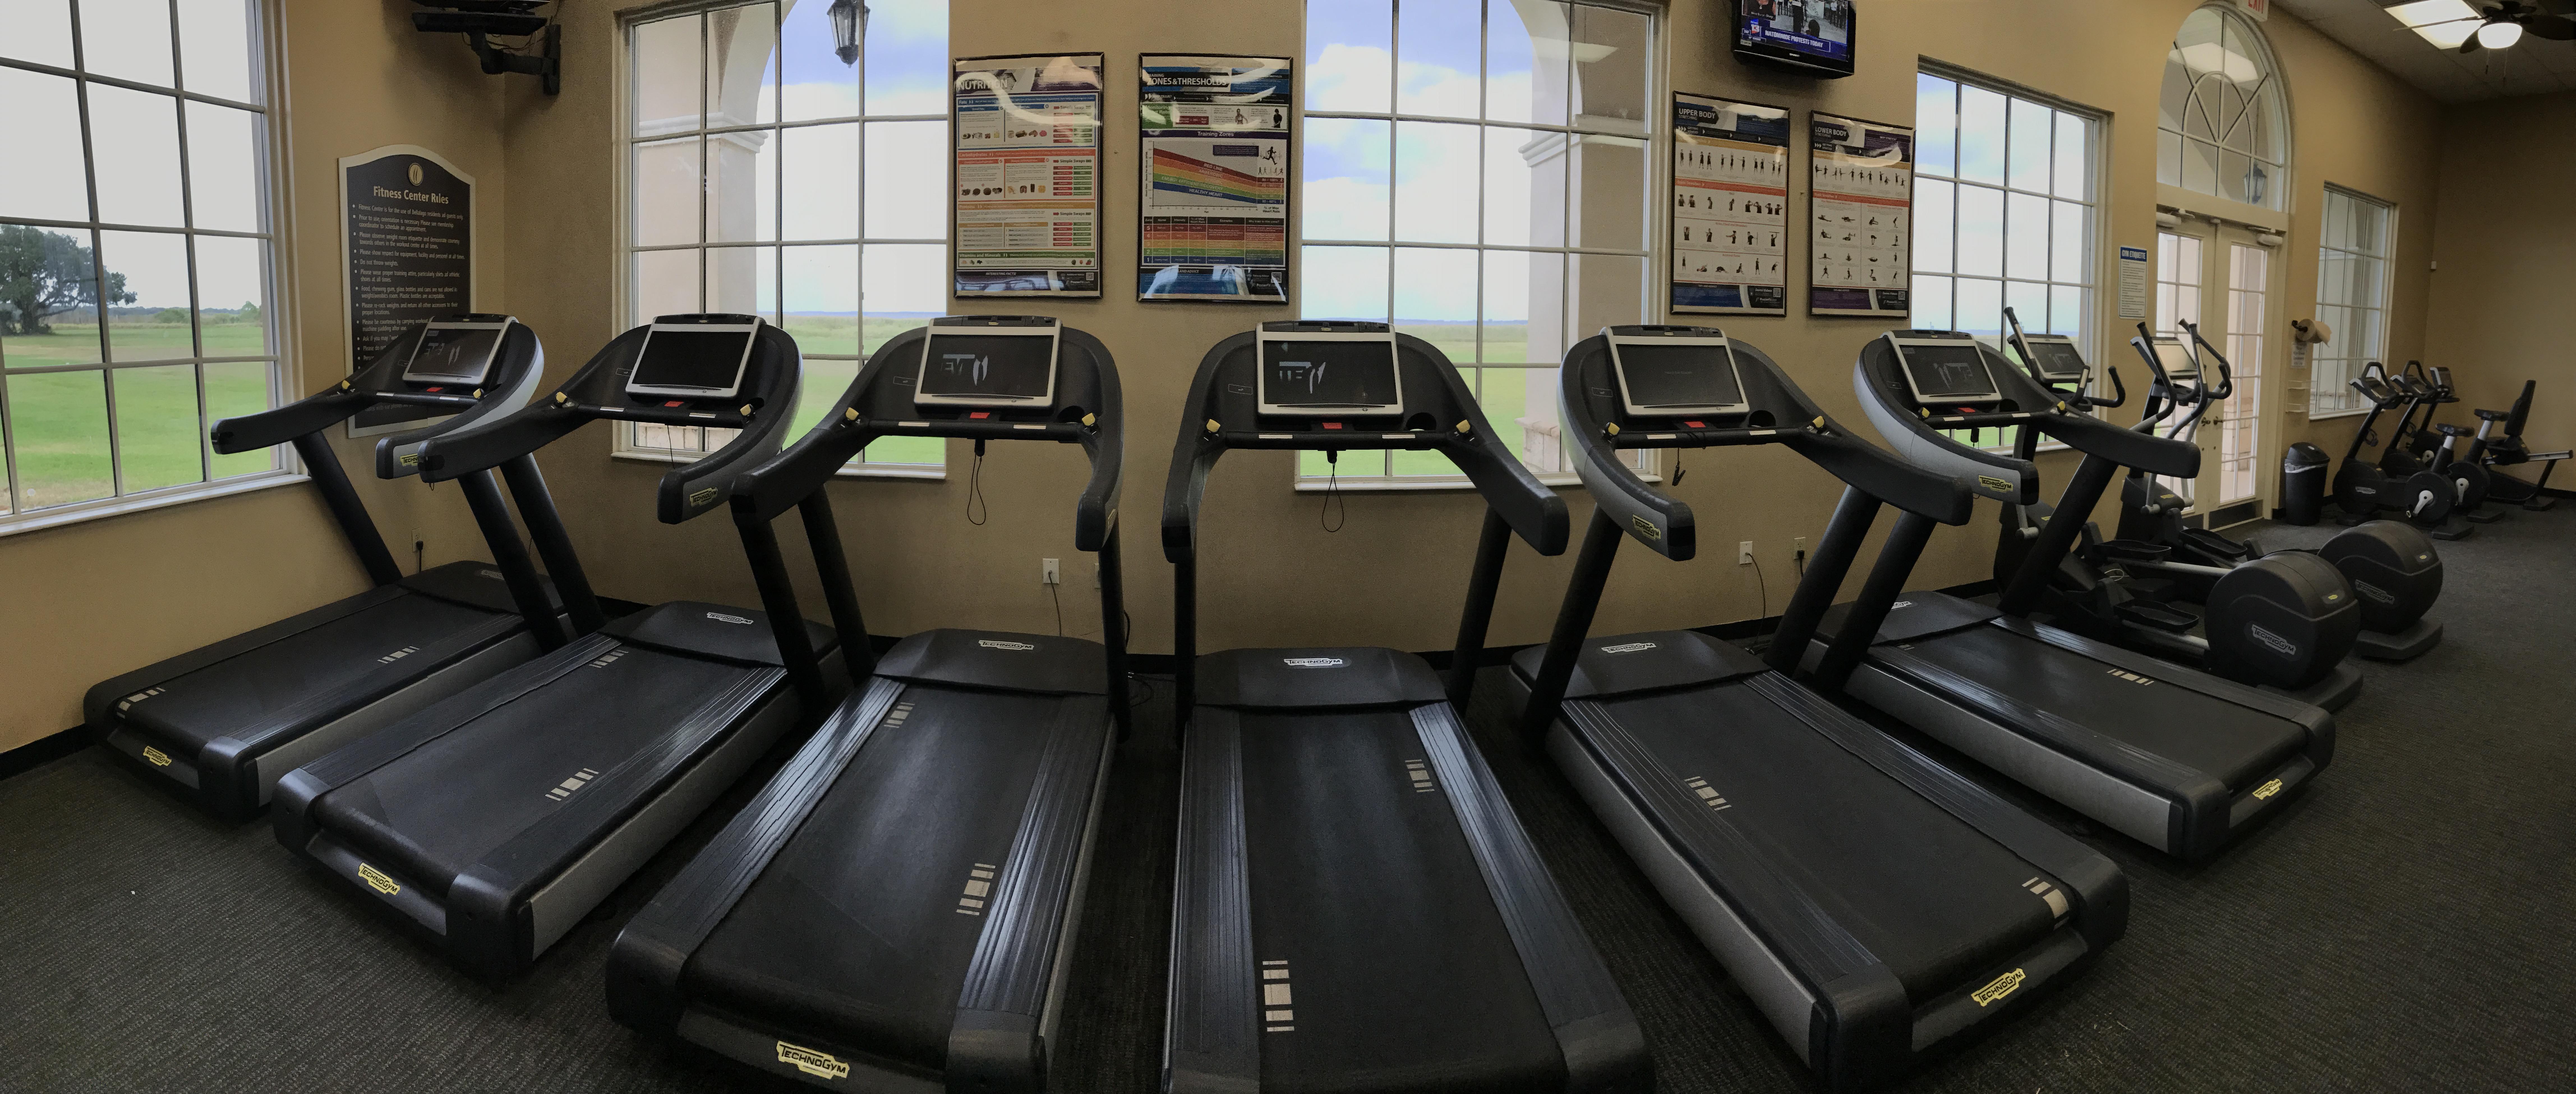 Fitness center bellalago